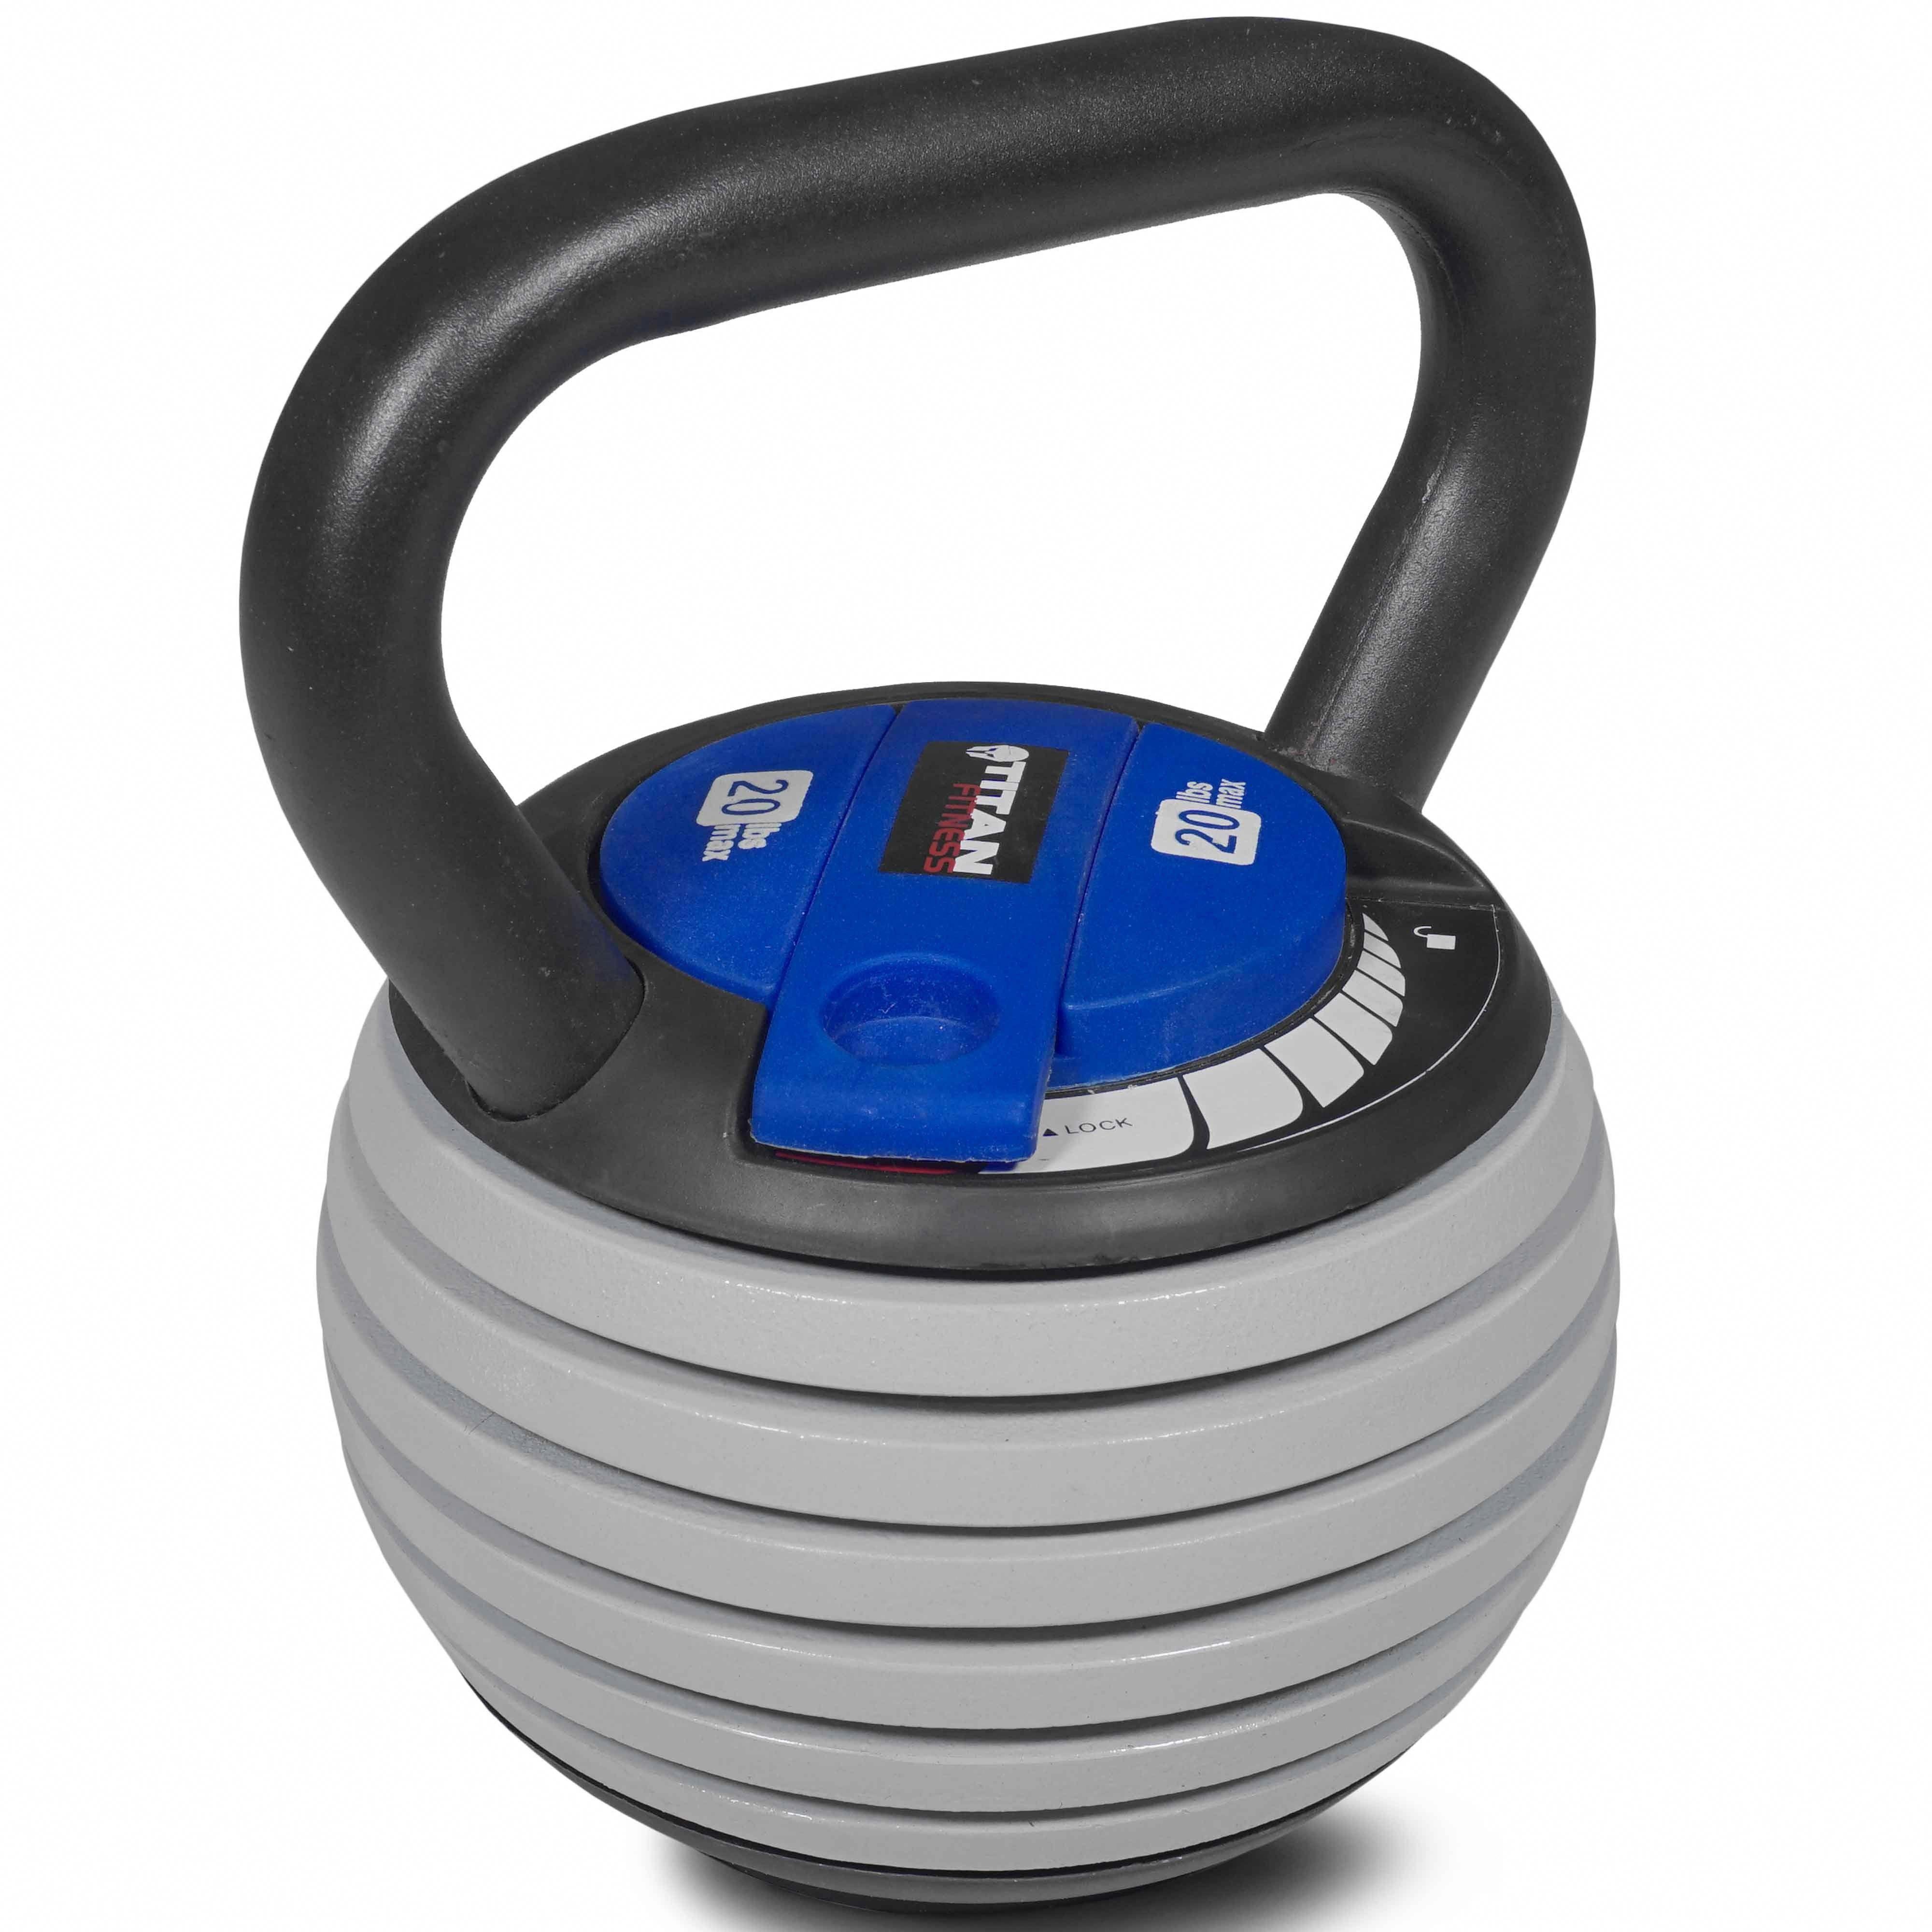 titan fitness 5 20 lb adjustable kettlebell weight lifting swingtitan fitness 5 20 lb adjustable kettlebell weight lifting swing workout kettlebellbeginner